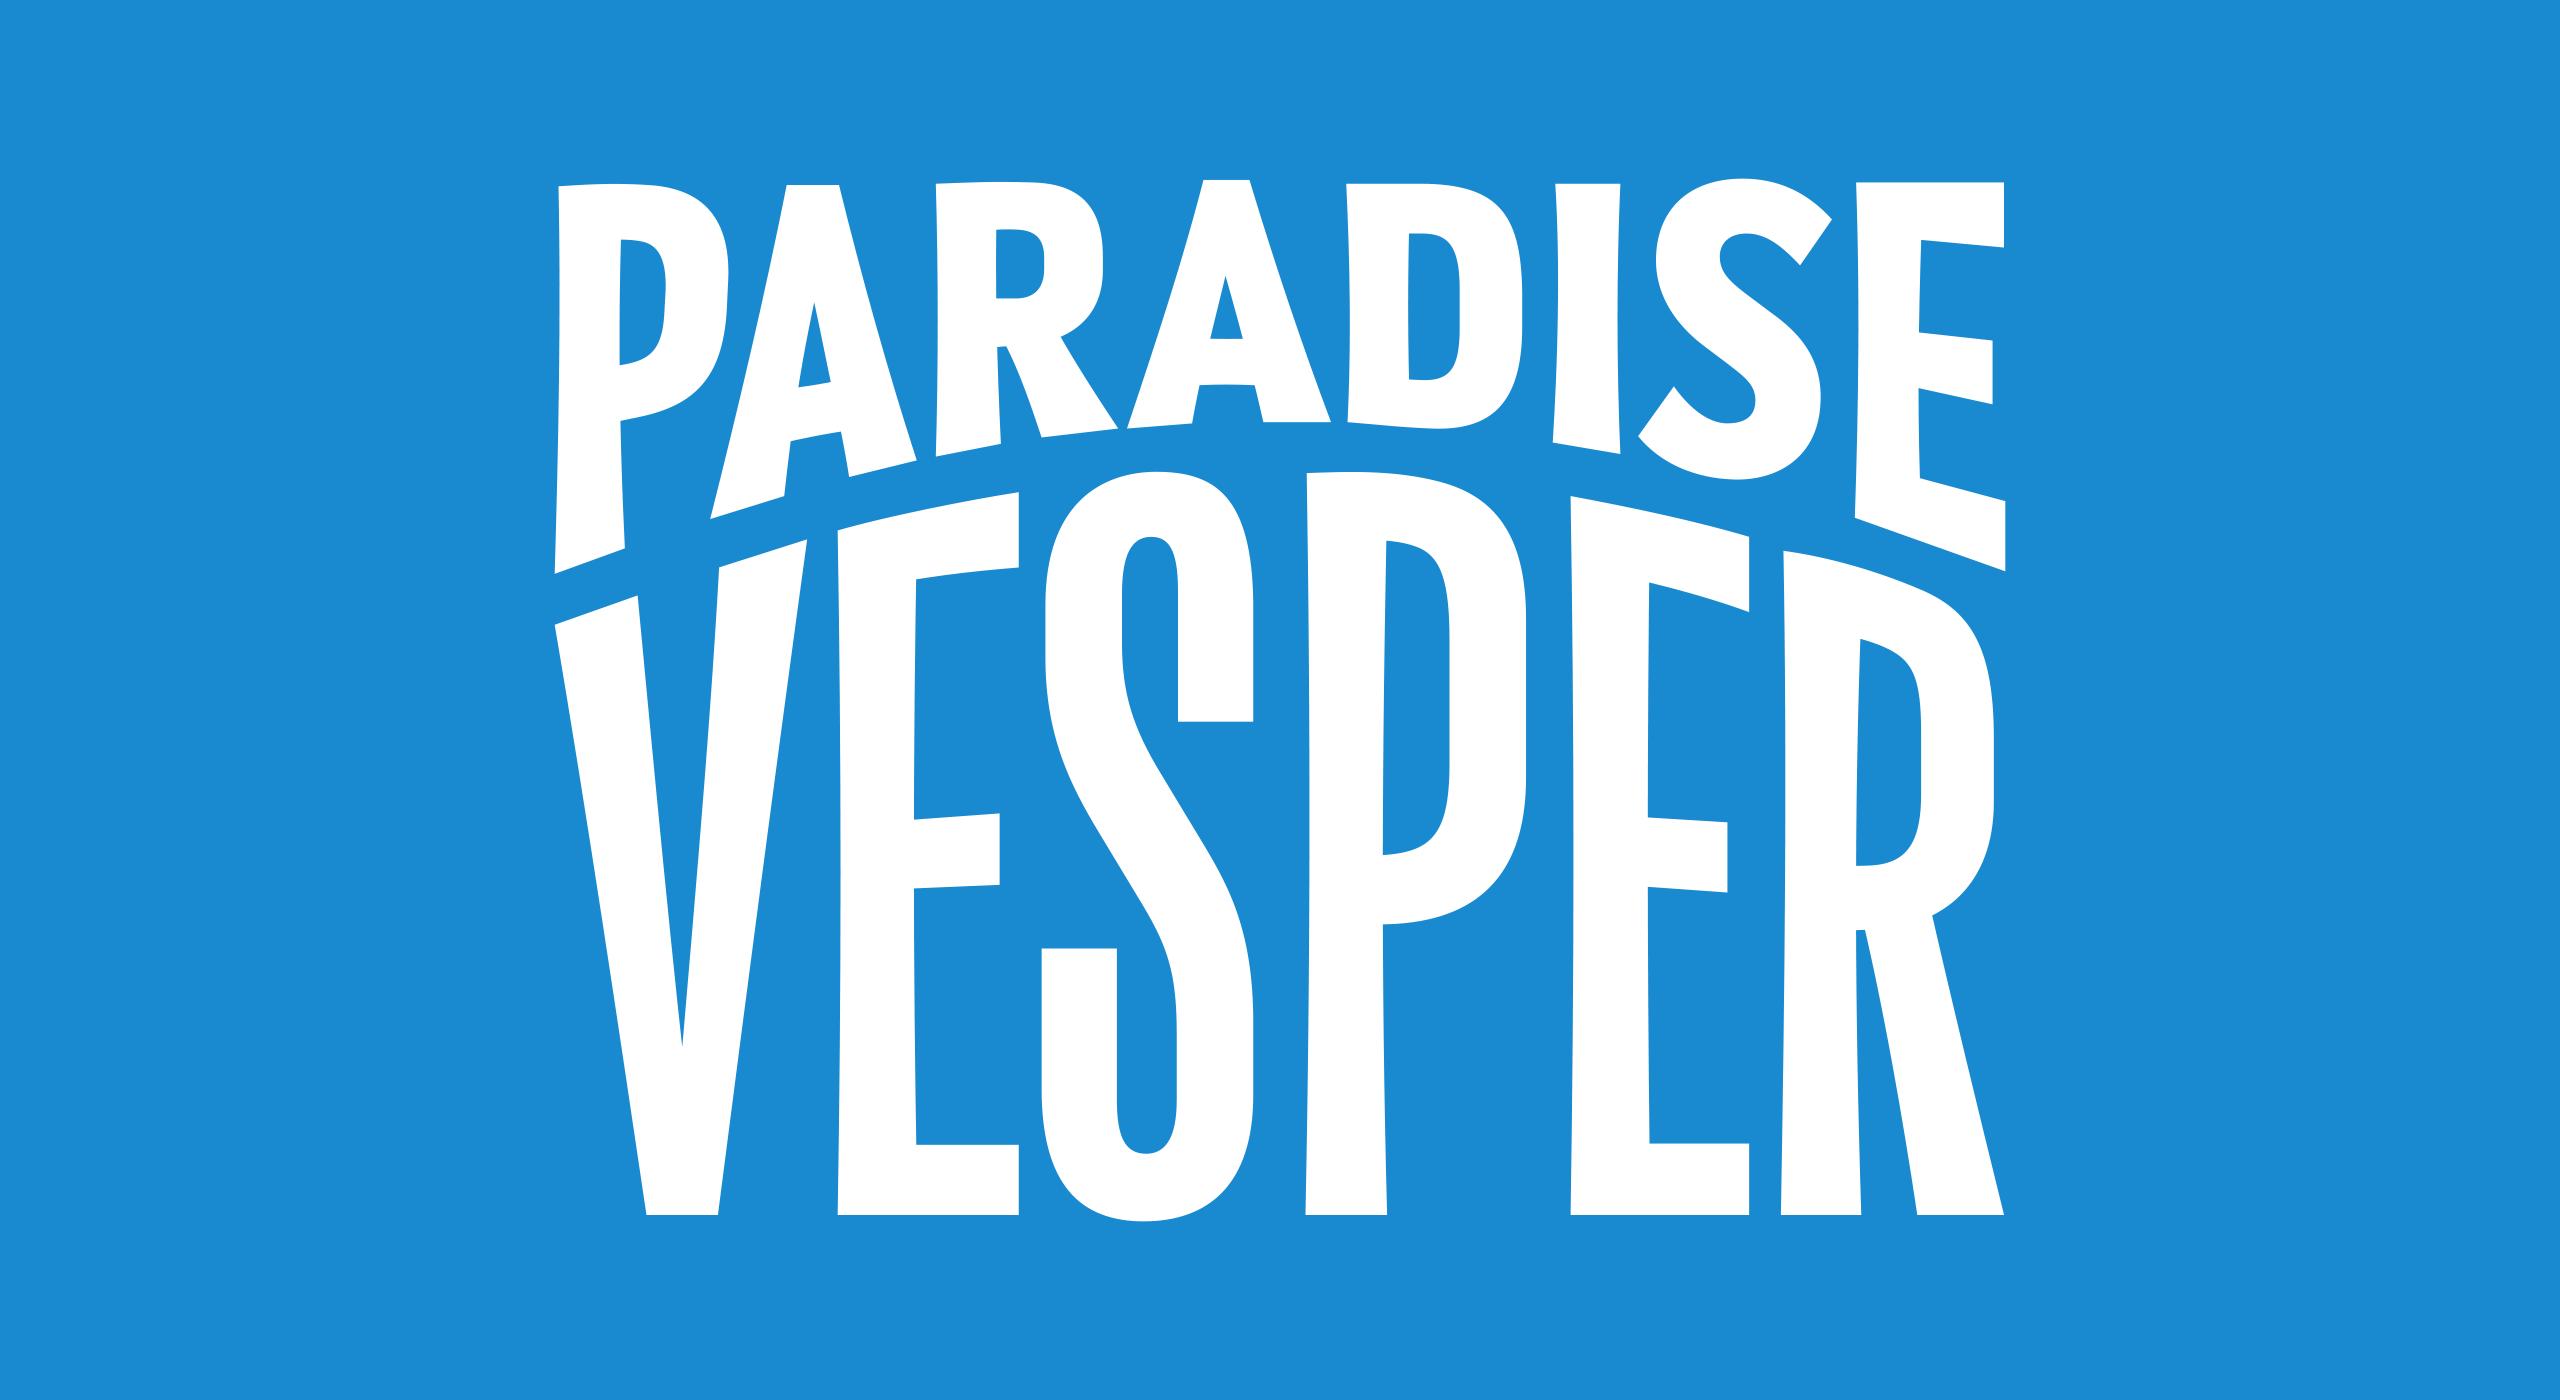 vesper_typo